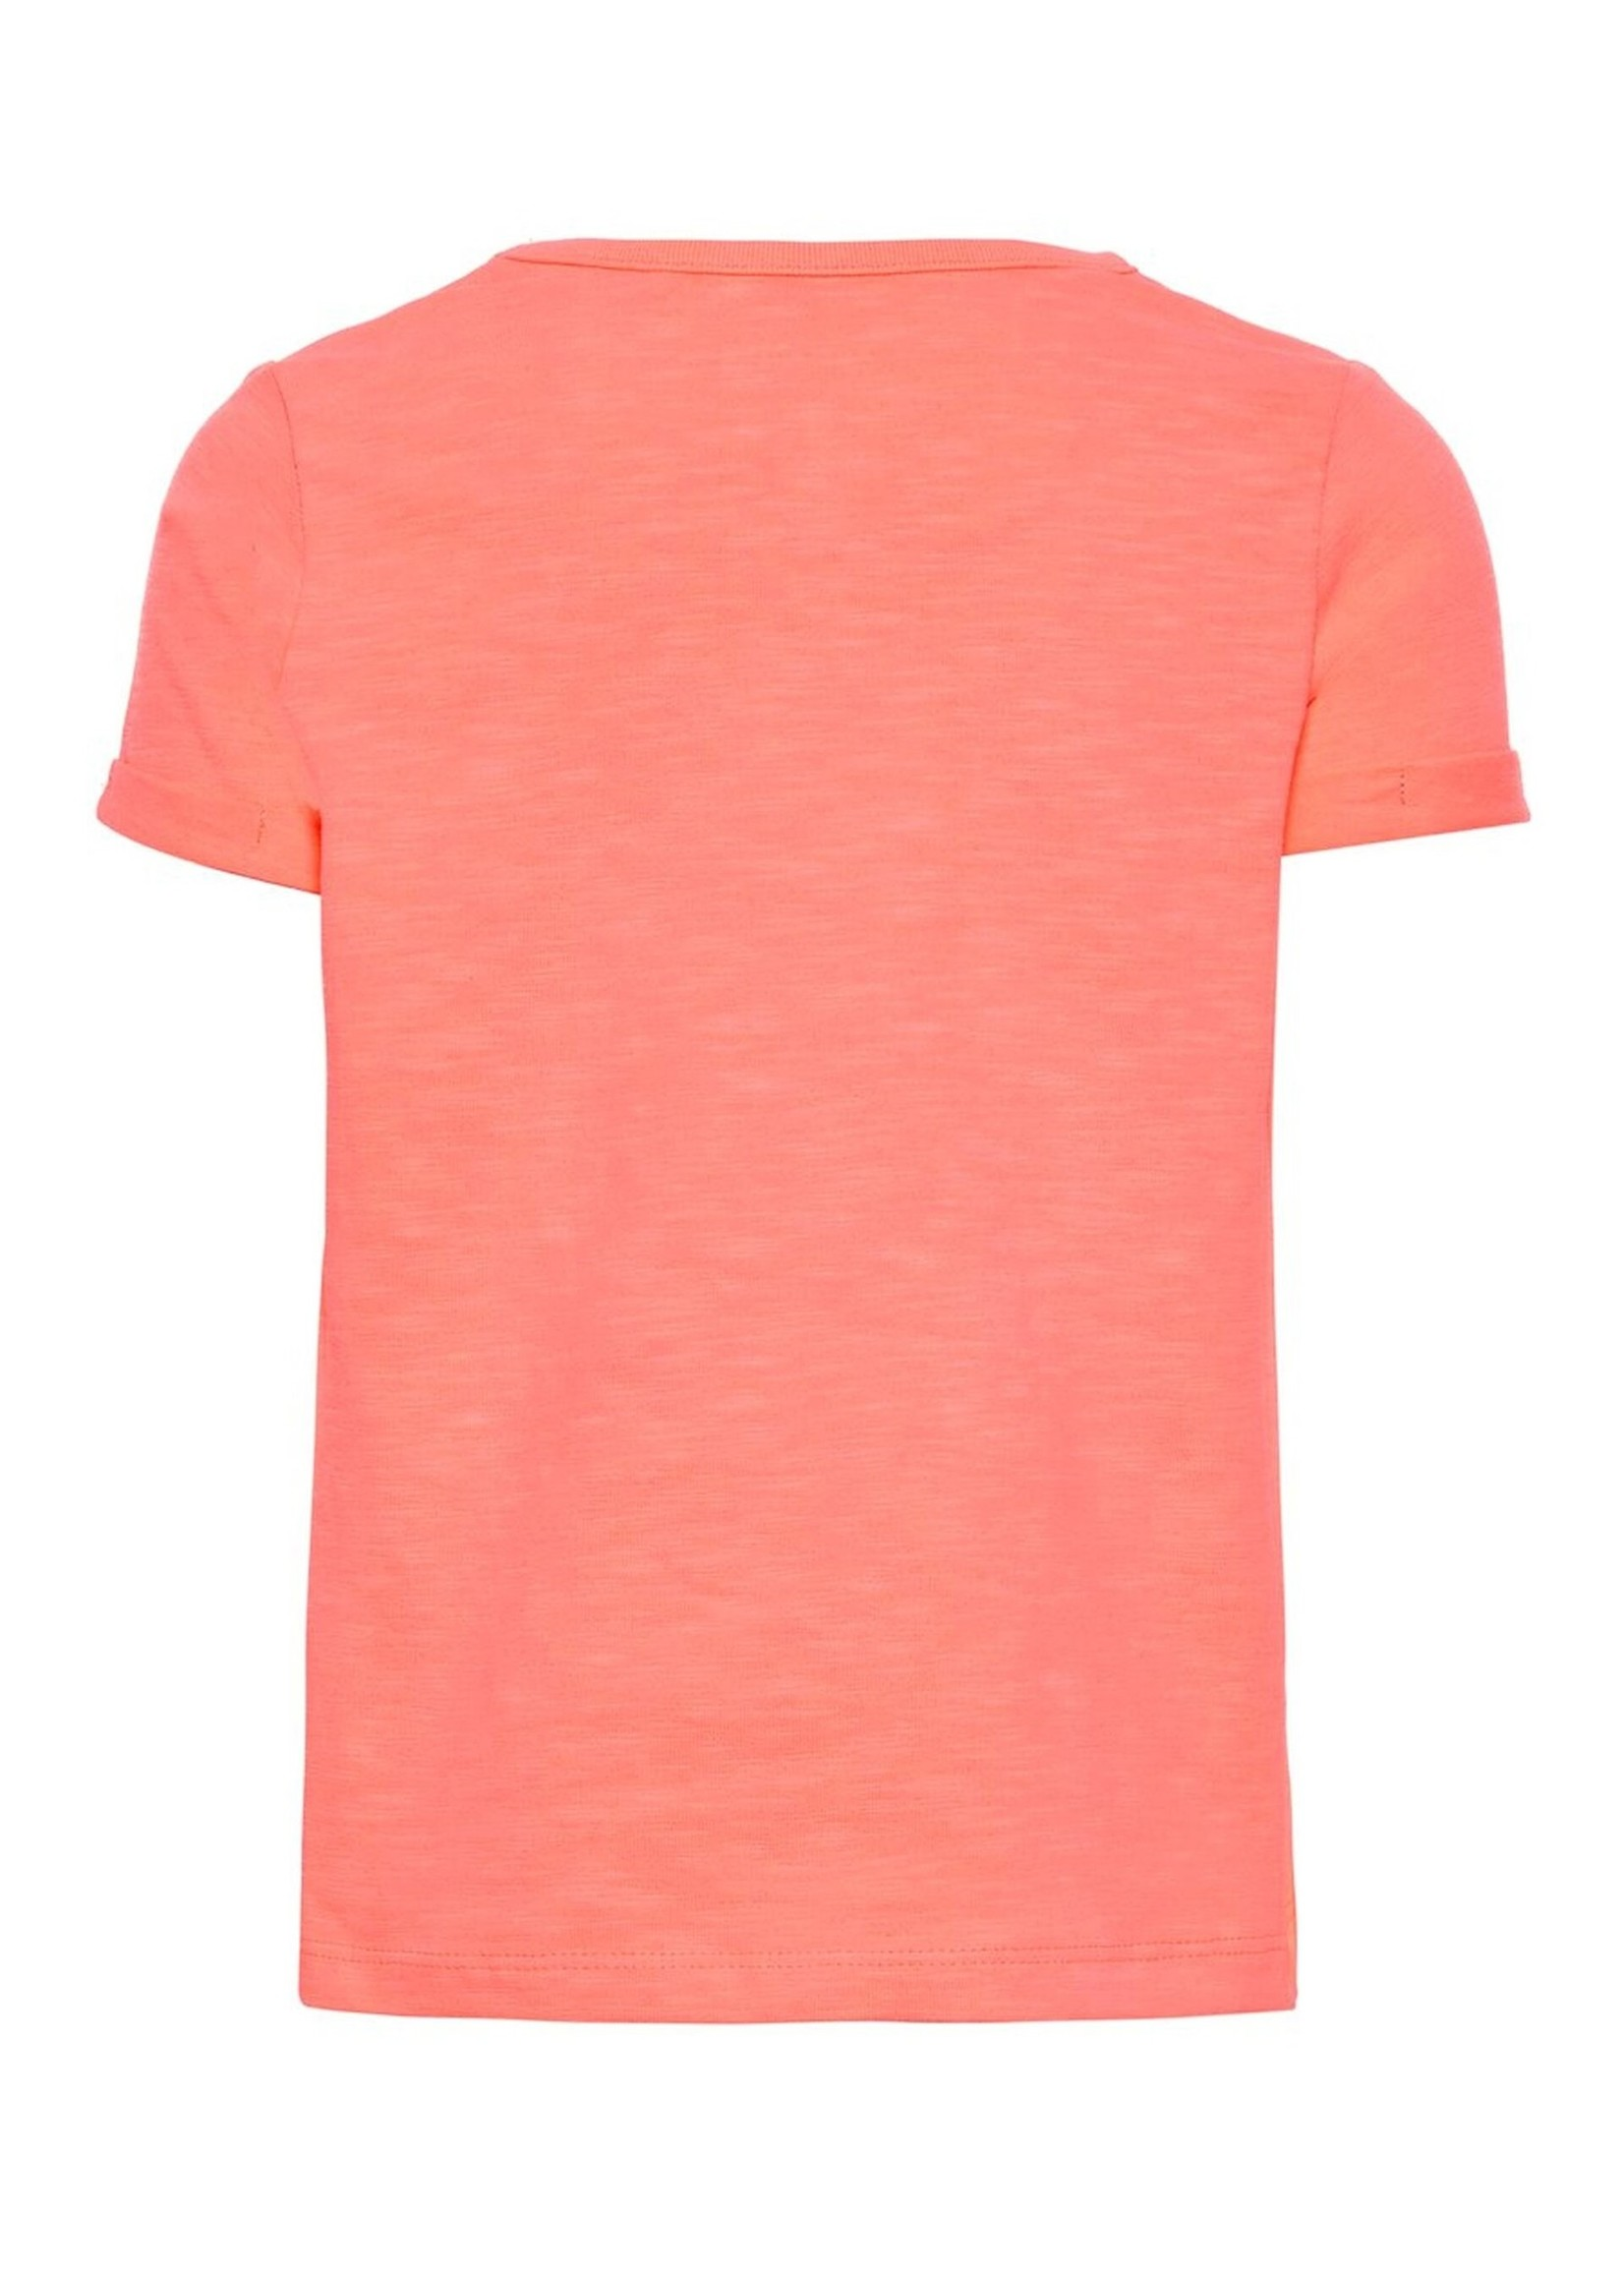 Name it T-shirt maat 92